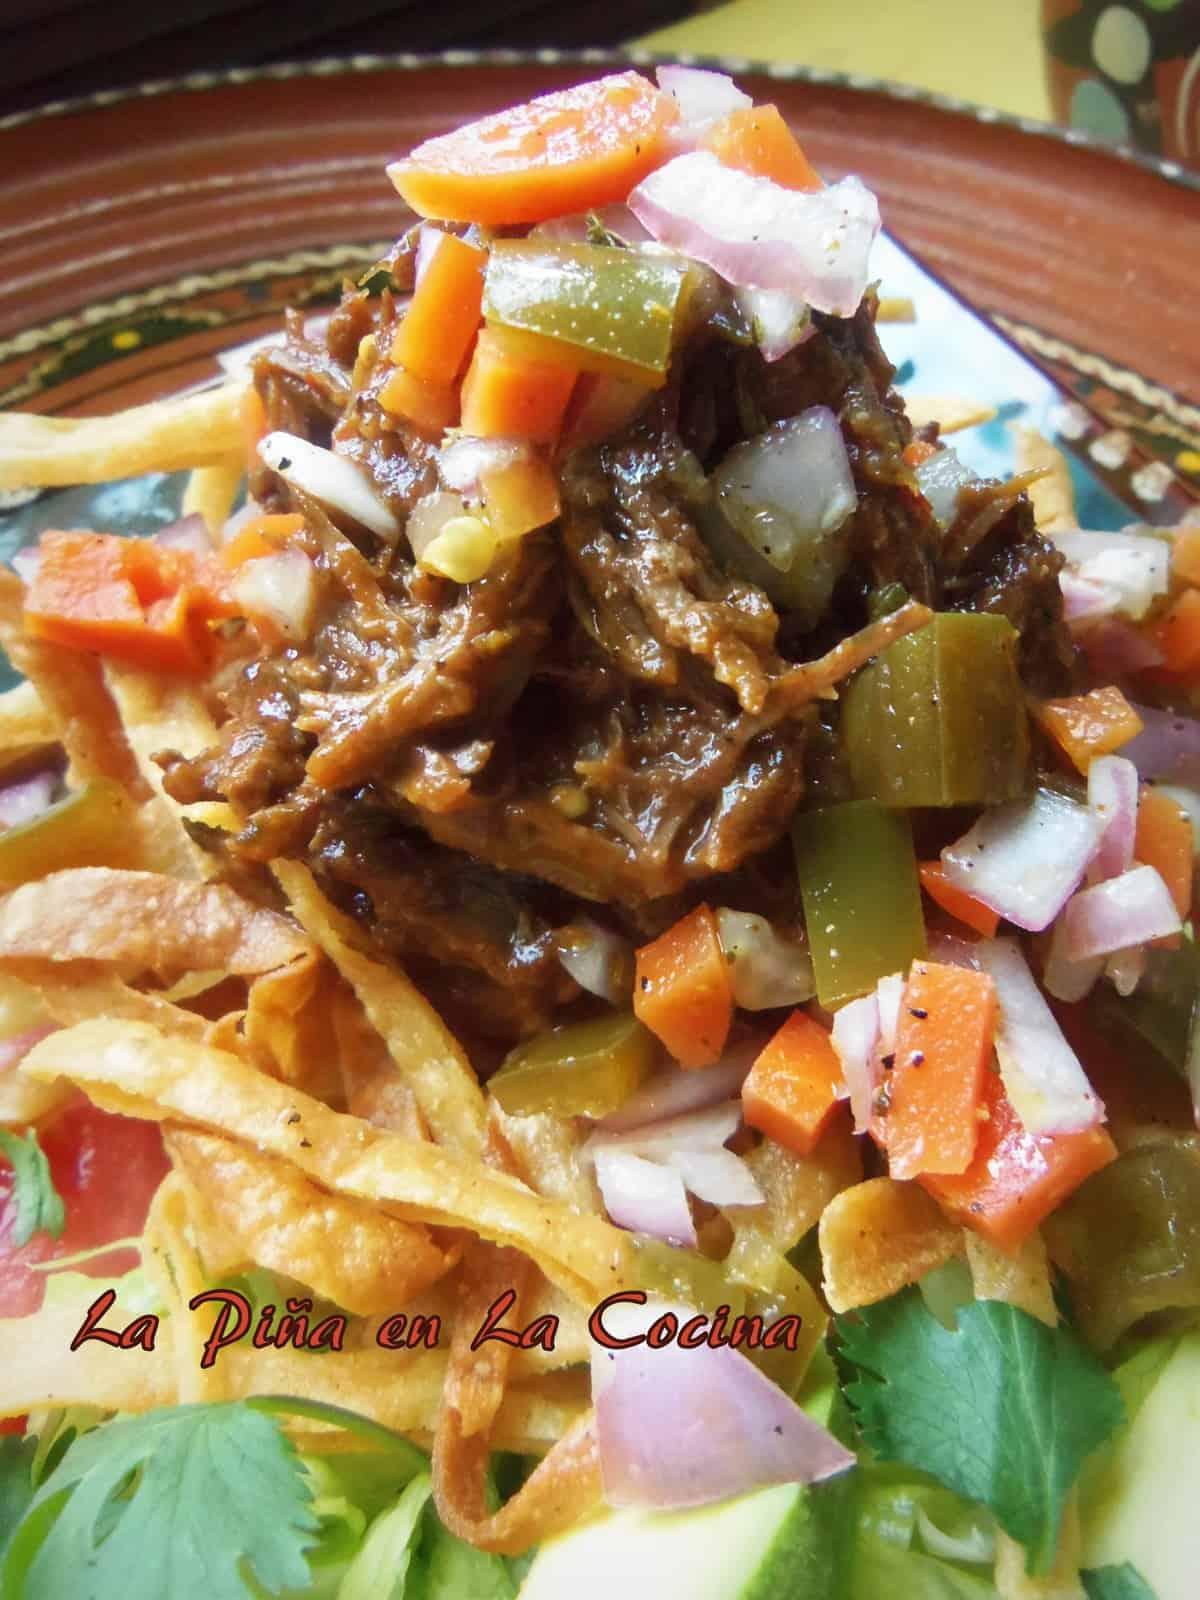 Carne Deshebrada (Braised Shredded Beef)